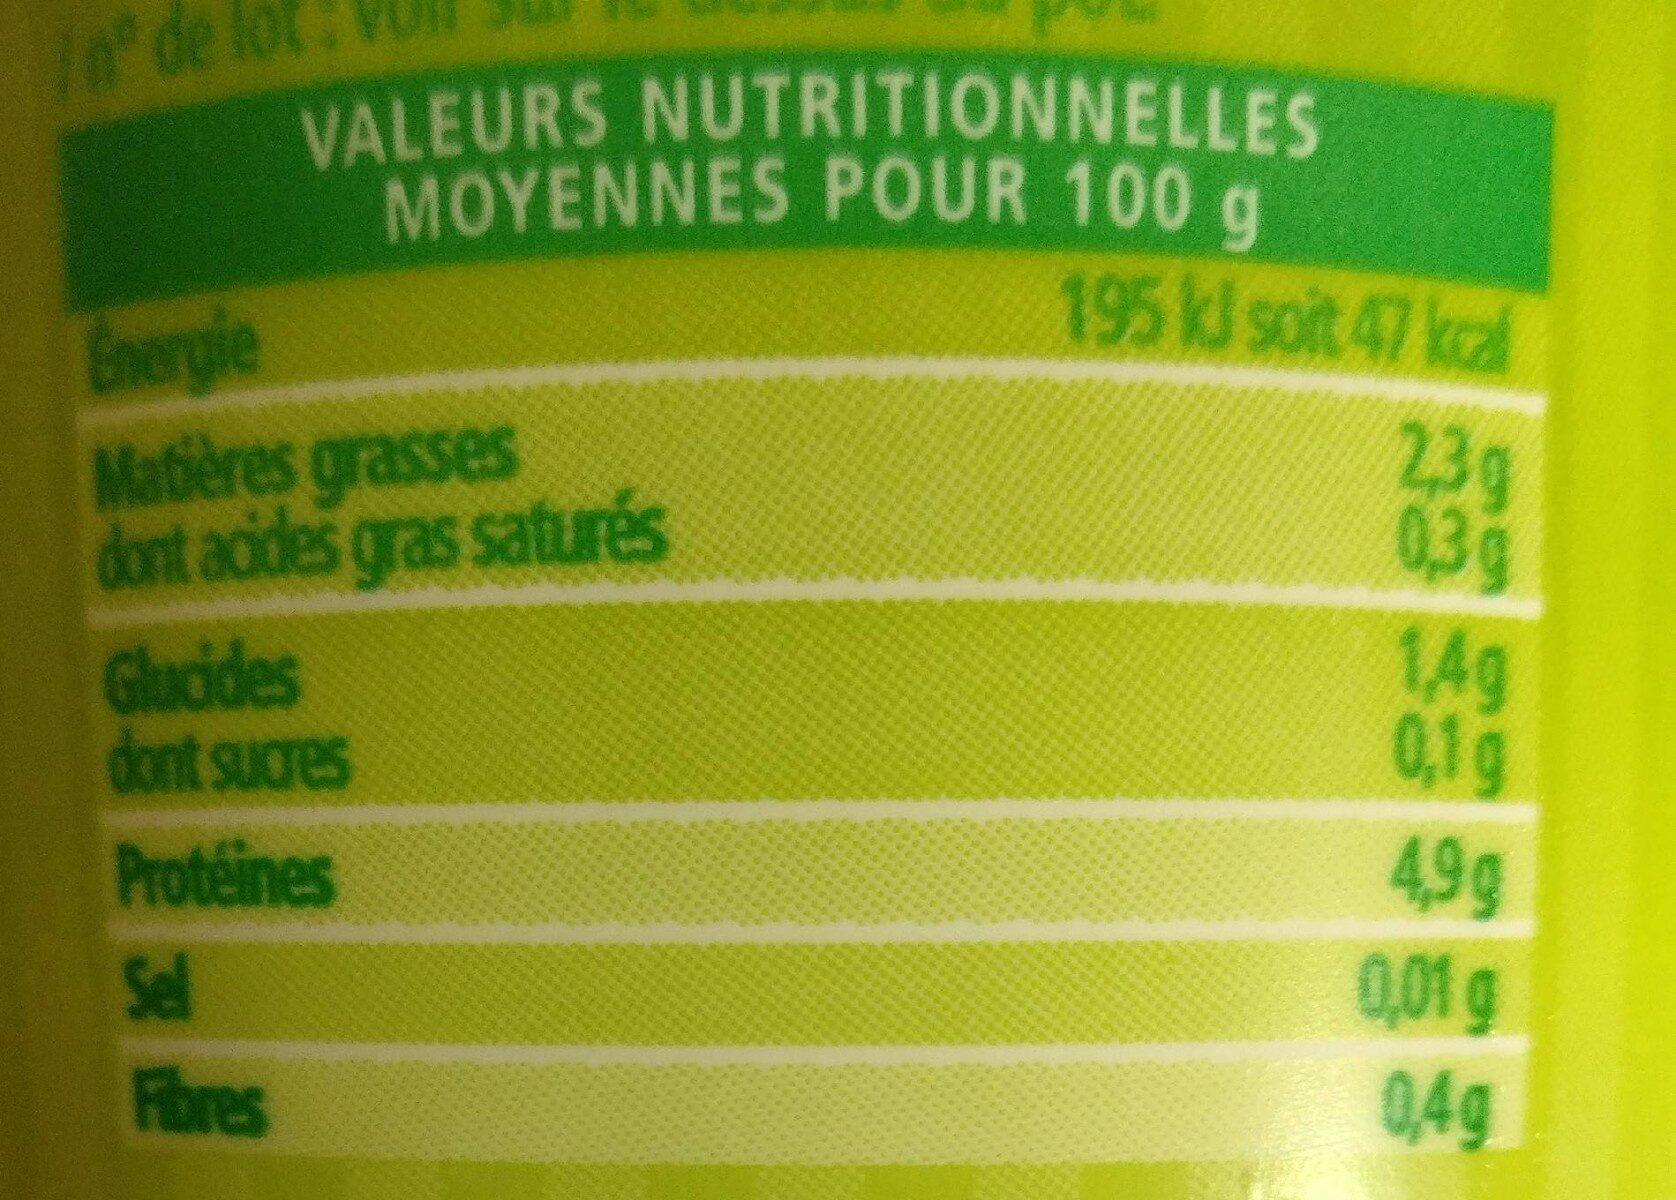 Soja Brassé Nature - Informations nutritionnelles - fr